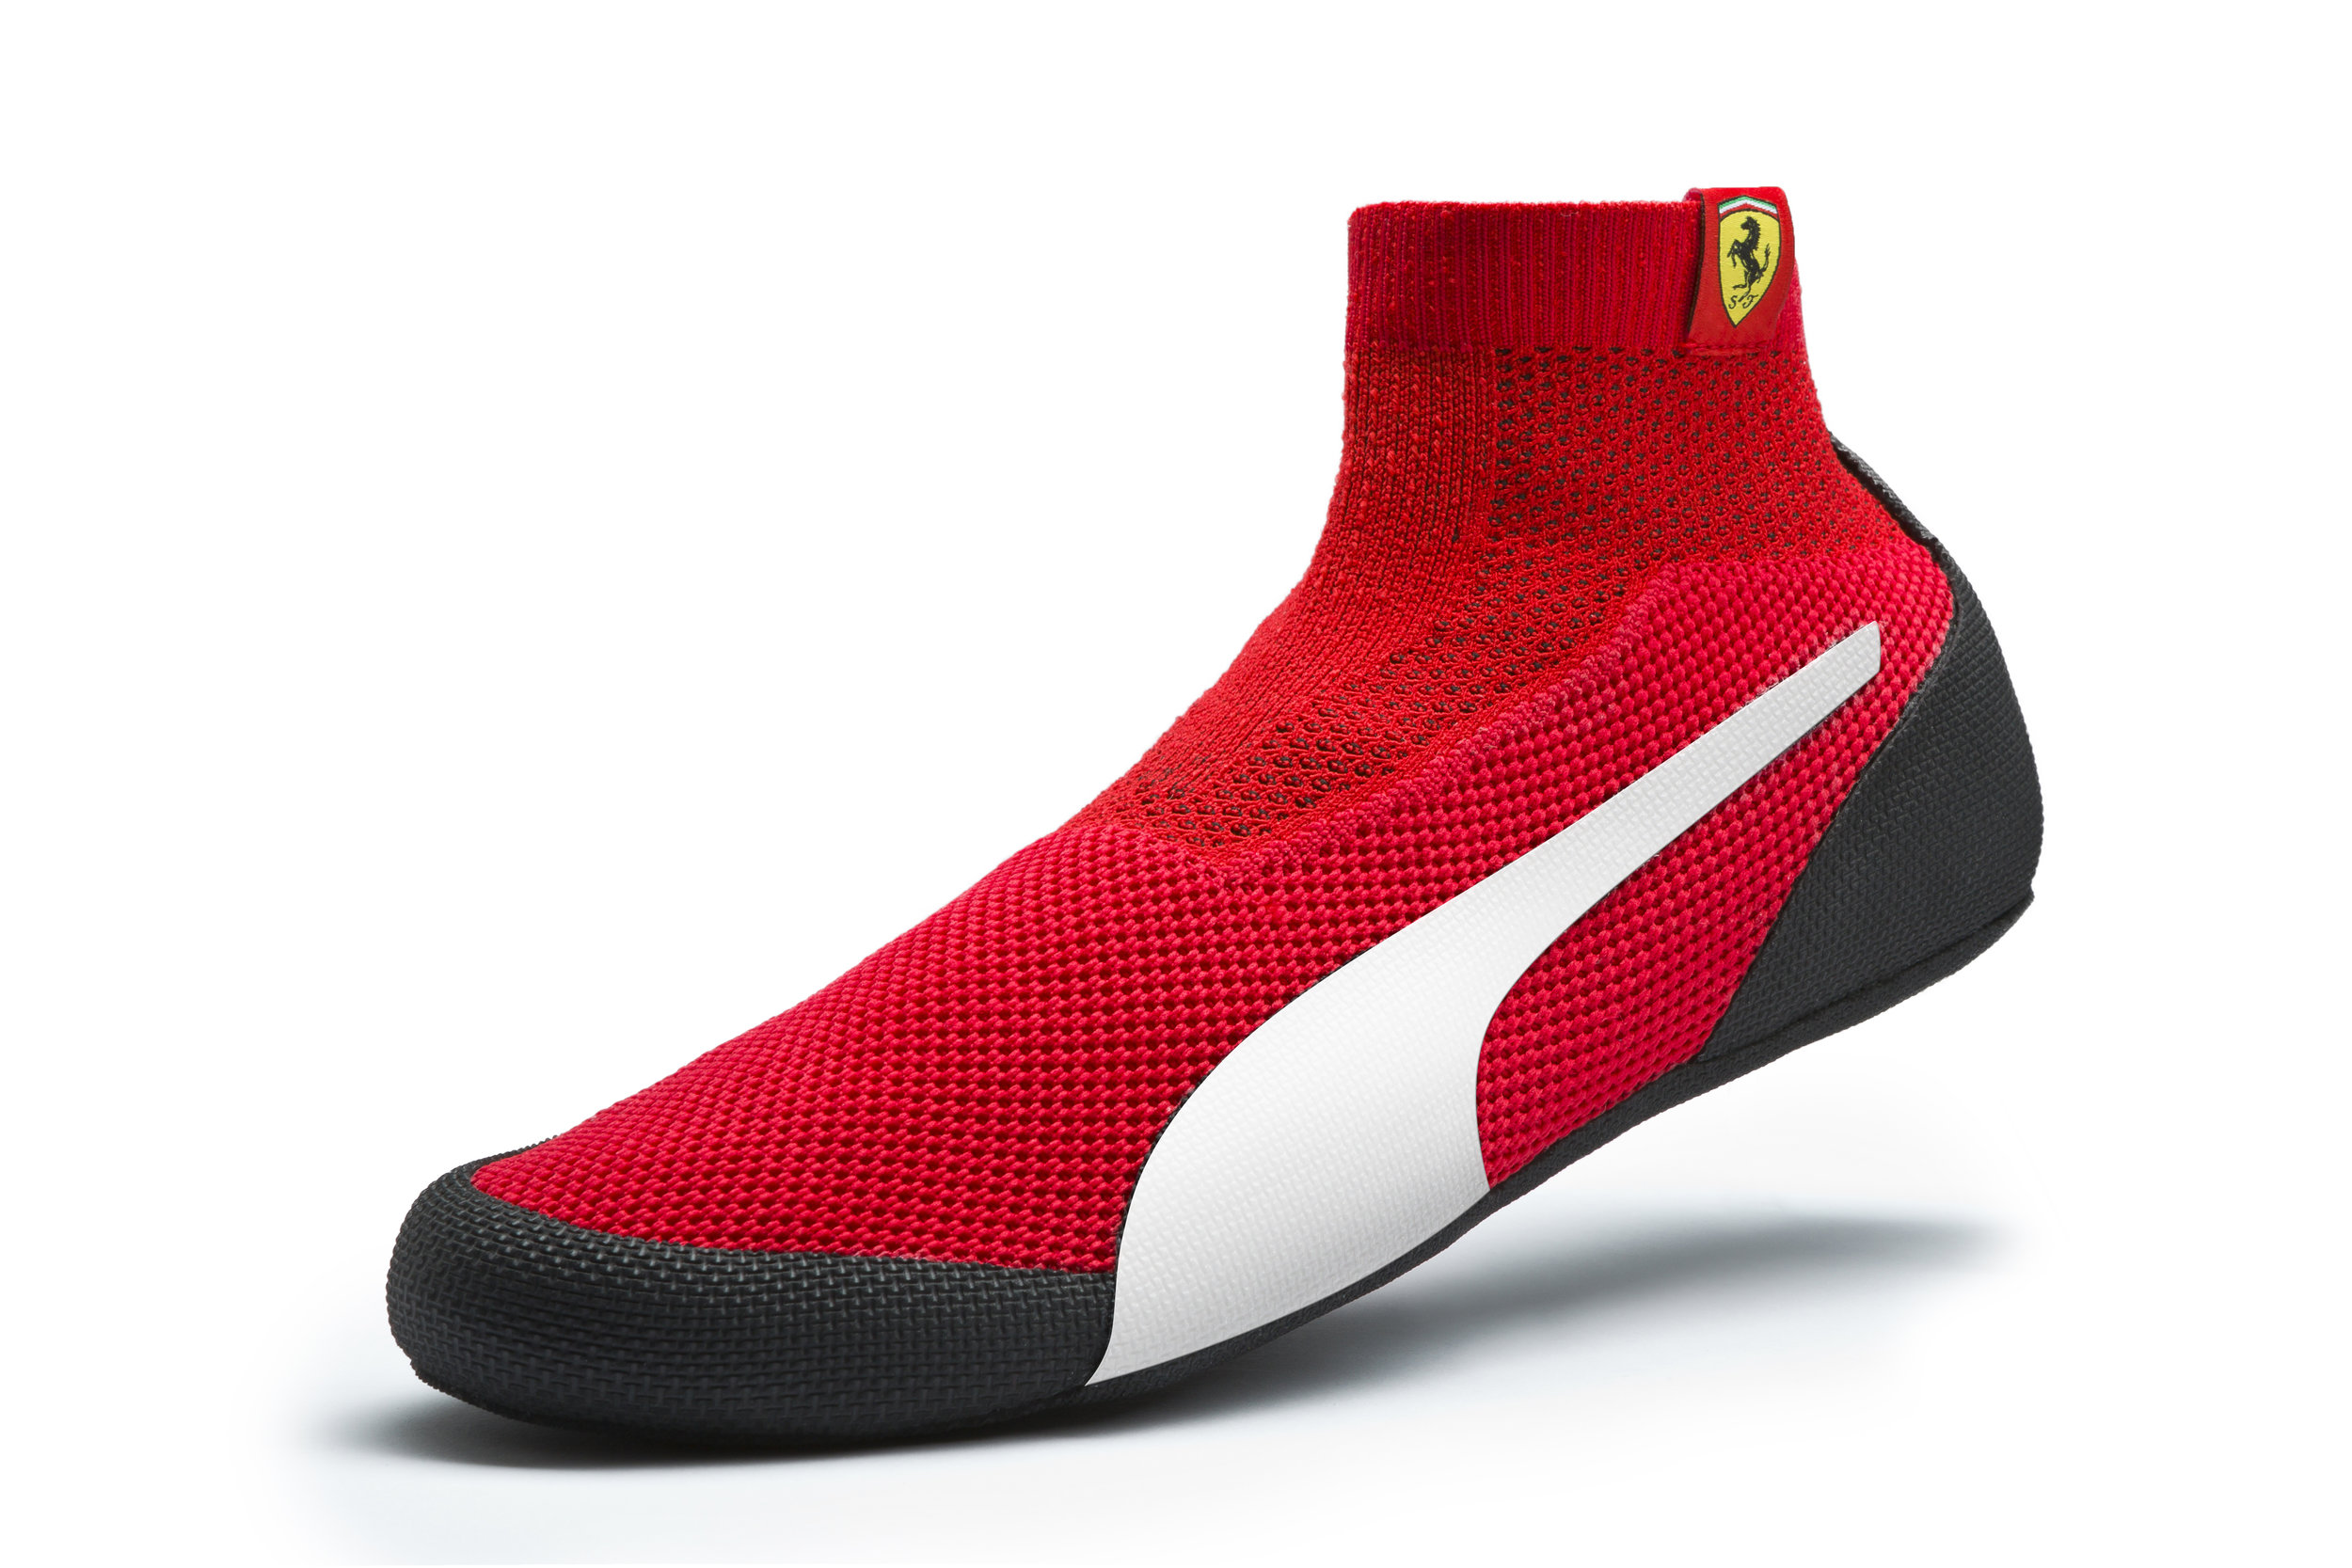 PUMA evoKNIT Driver Pro Formula 1 driver shoe